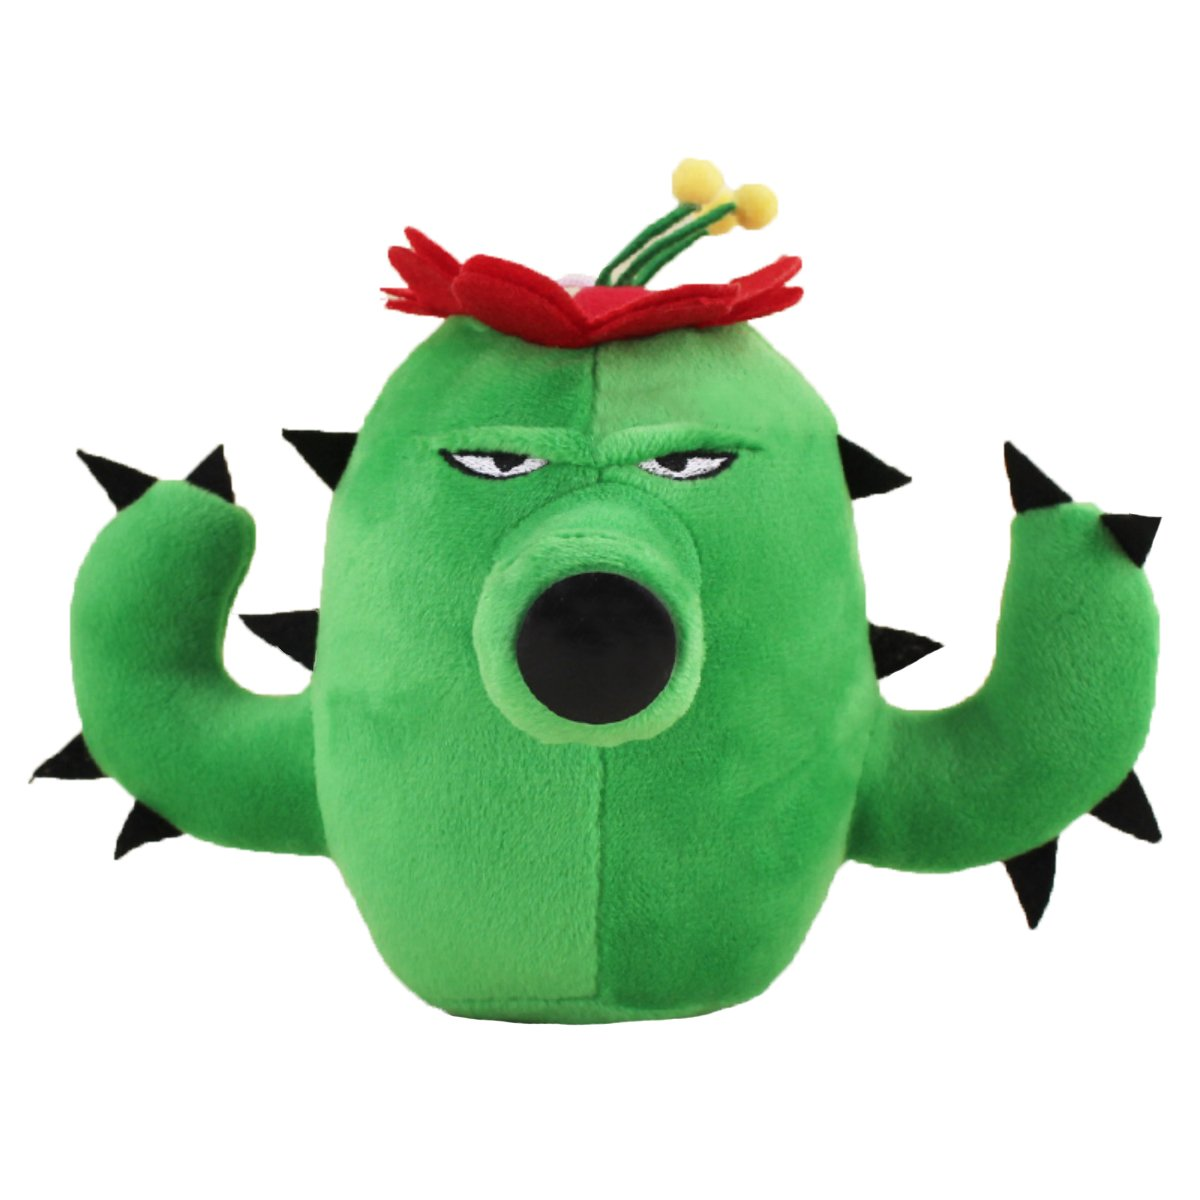 Amazon.com: Plants Vs Zombies 2 PVZ Figures Plush Baby